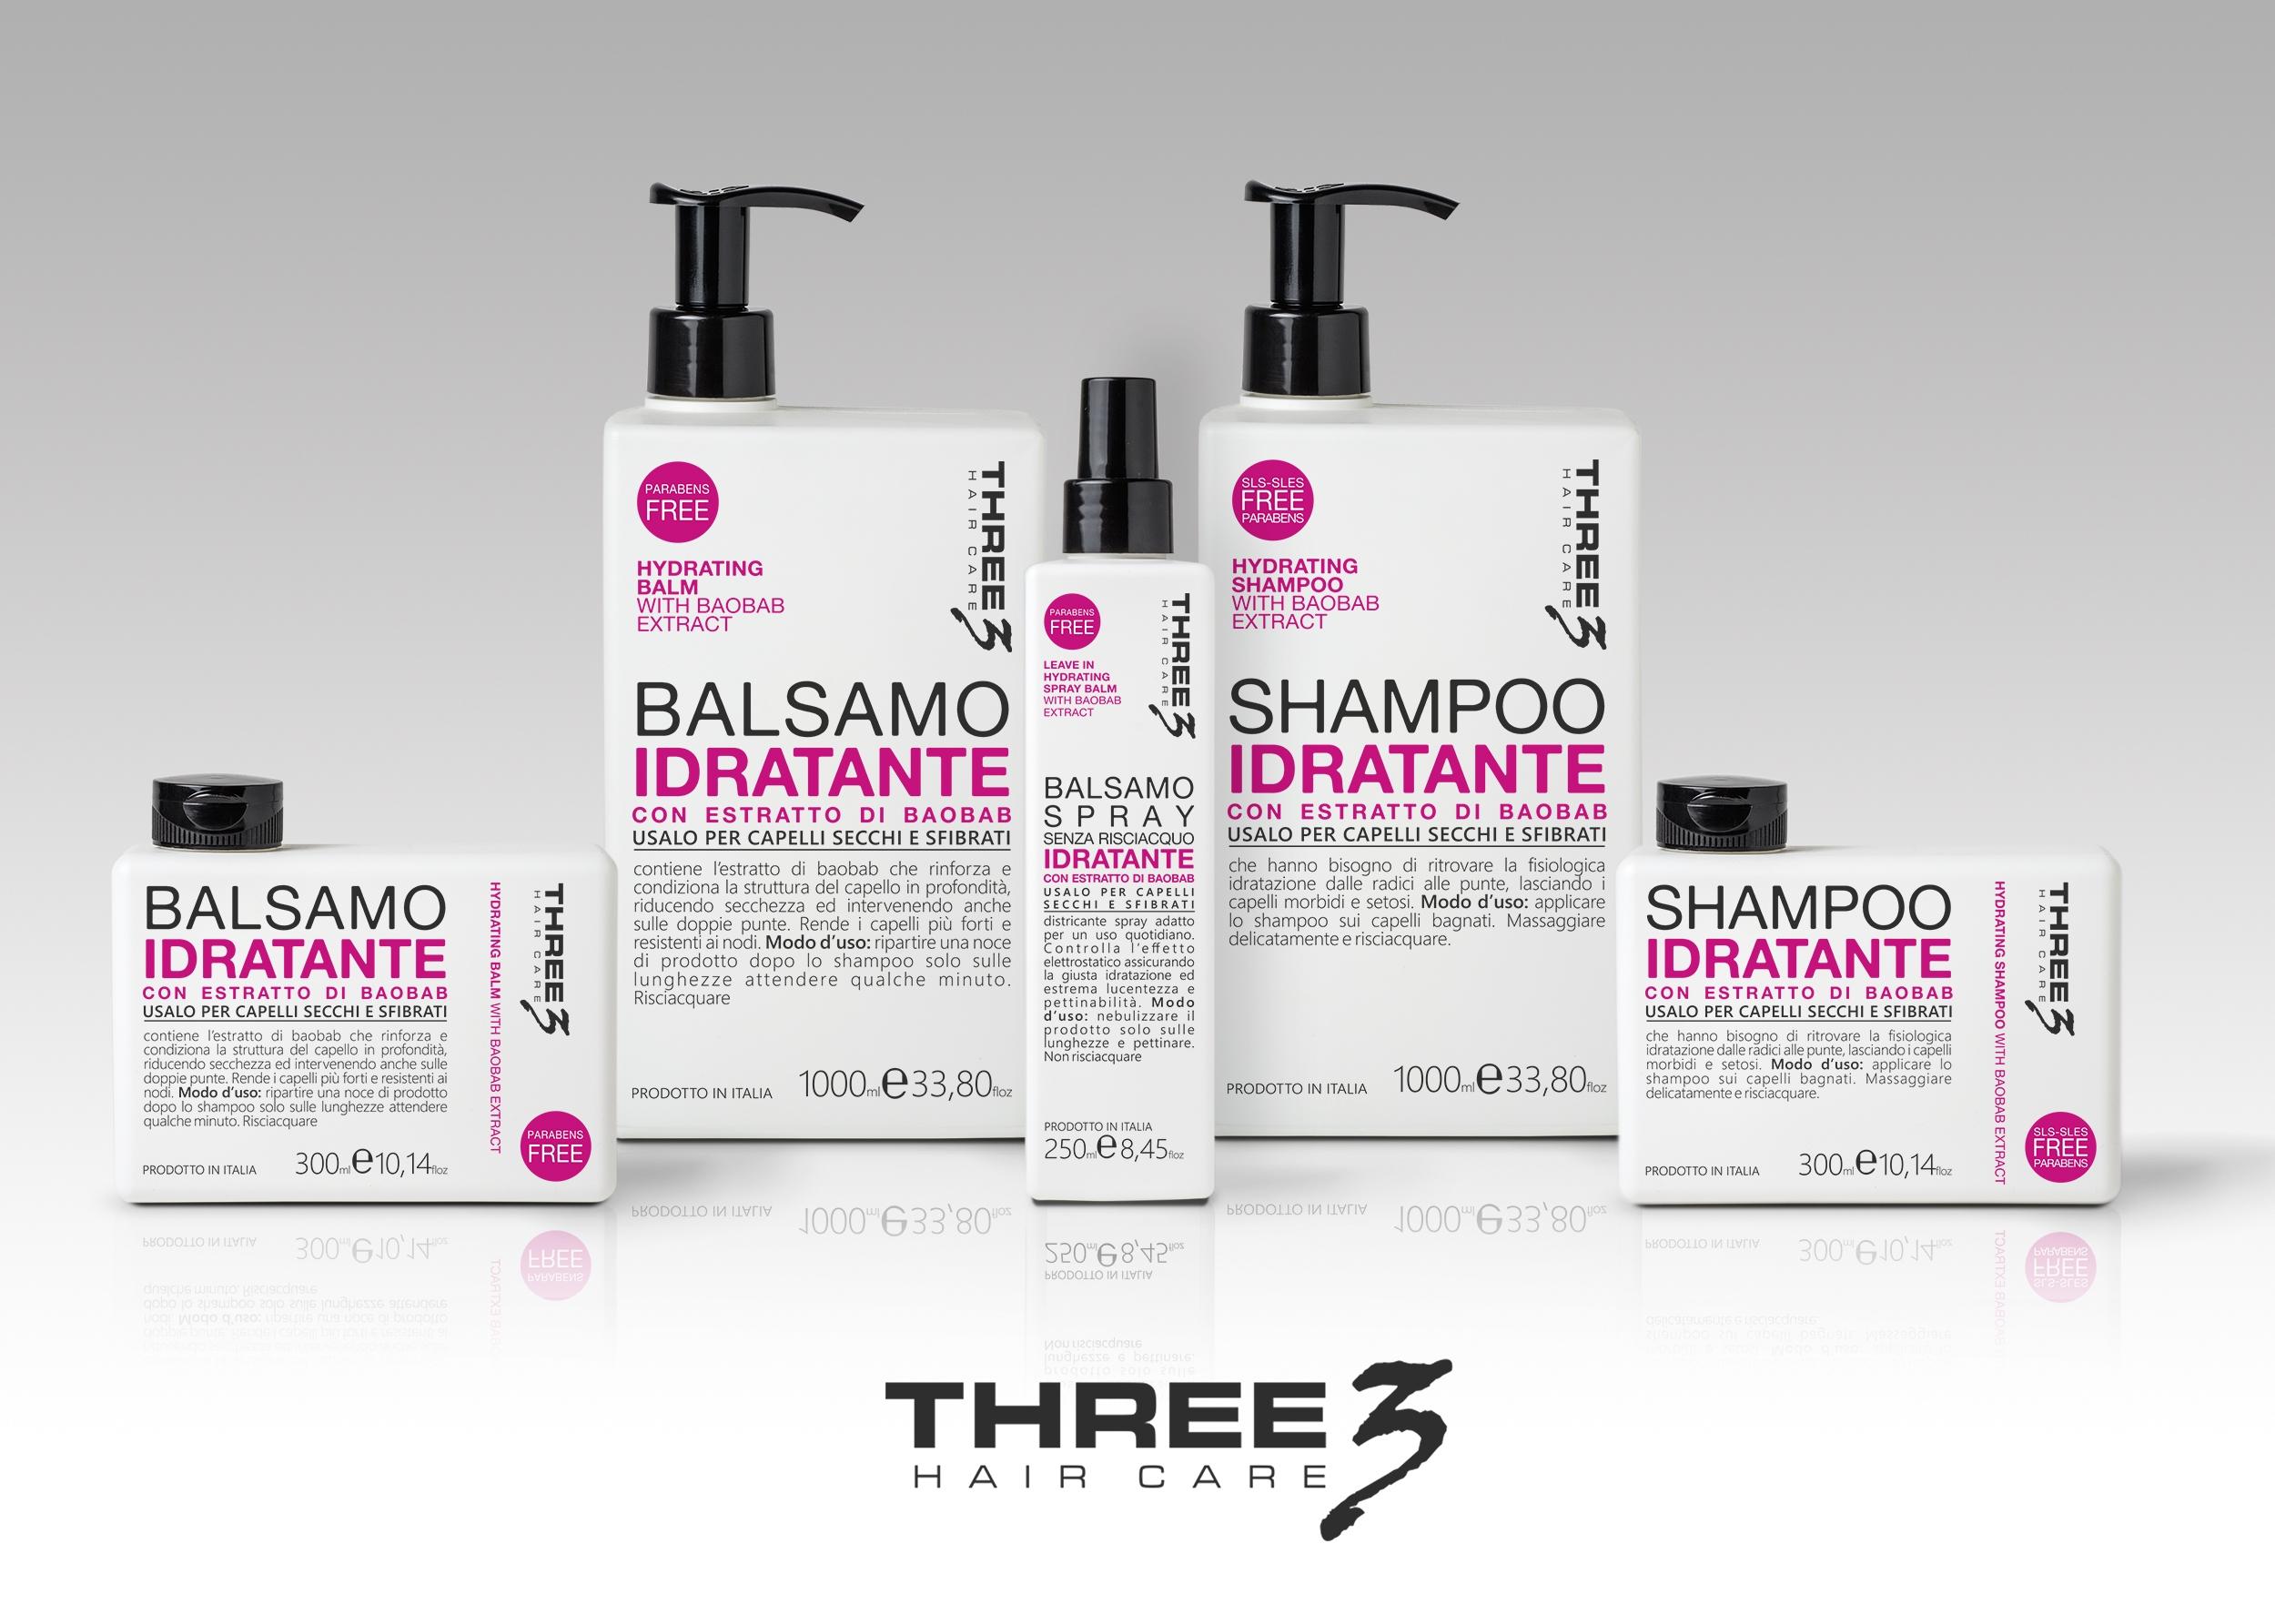 Tree3 Hydrating serie